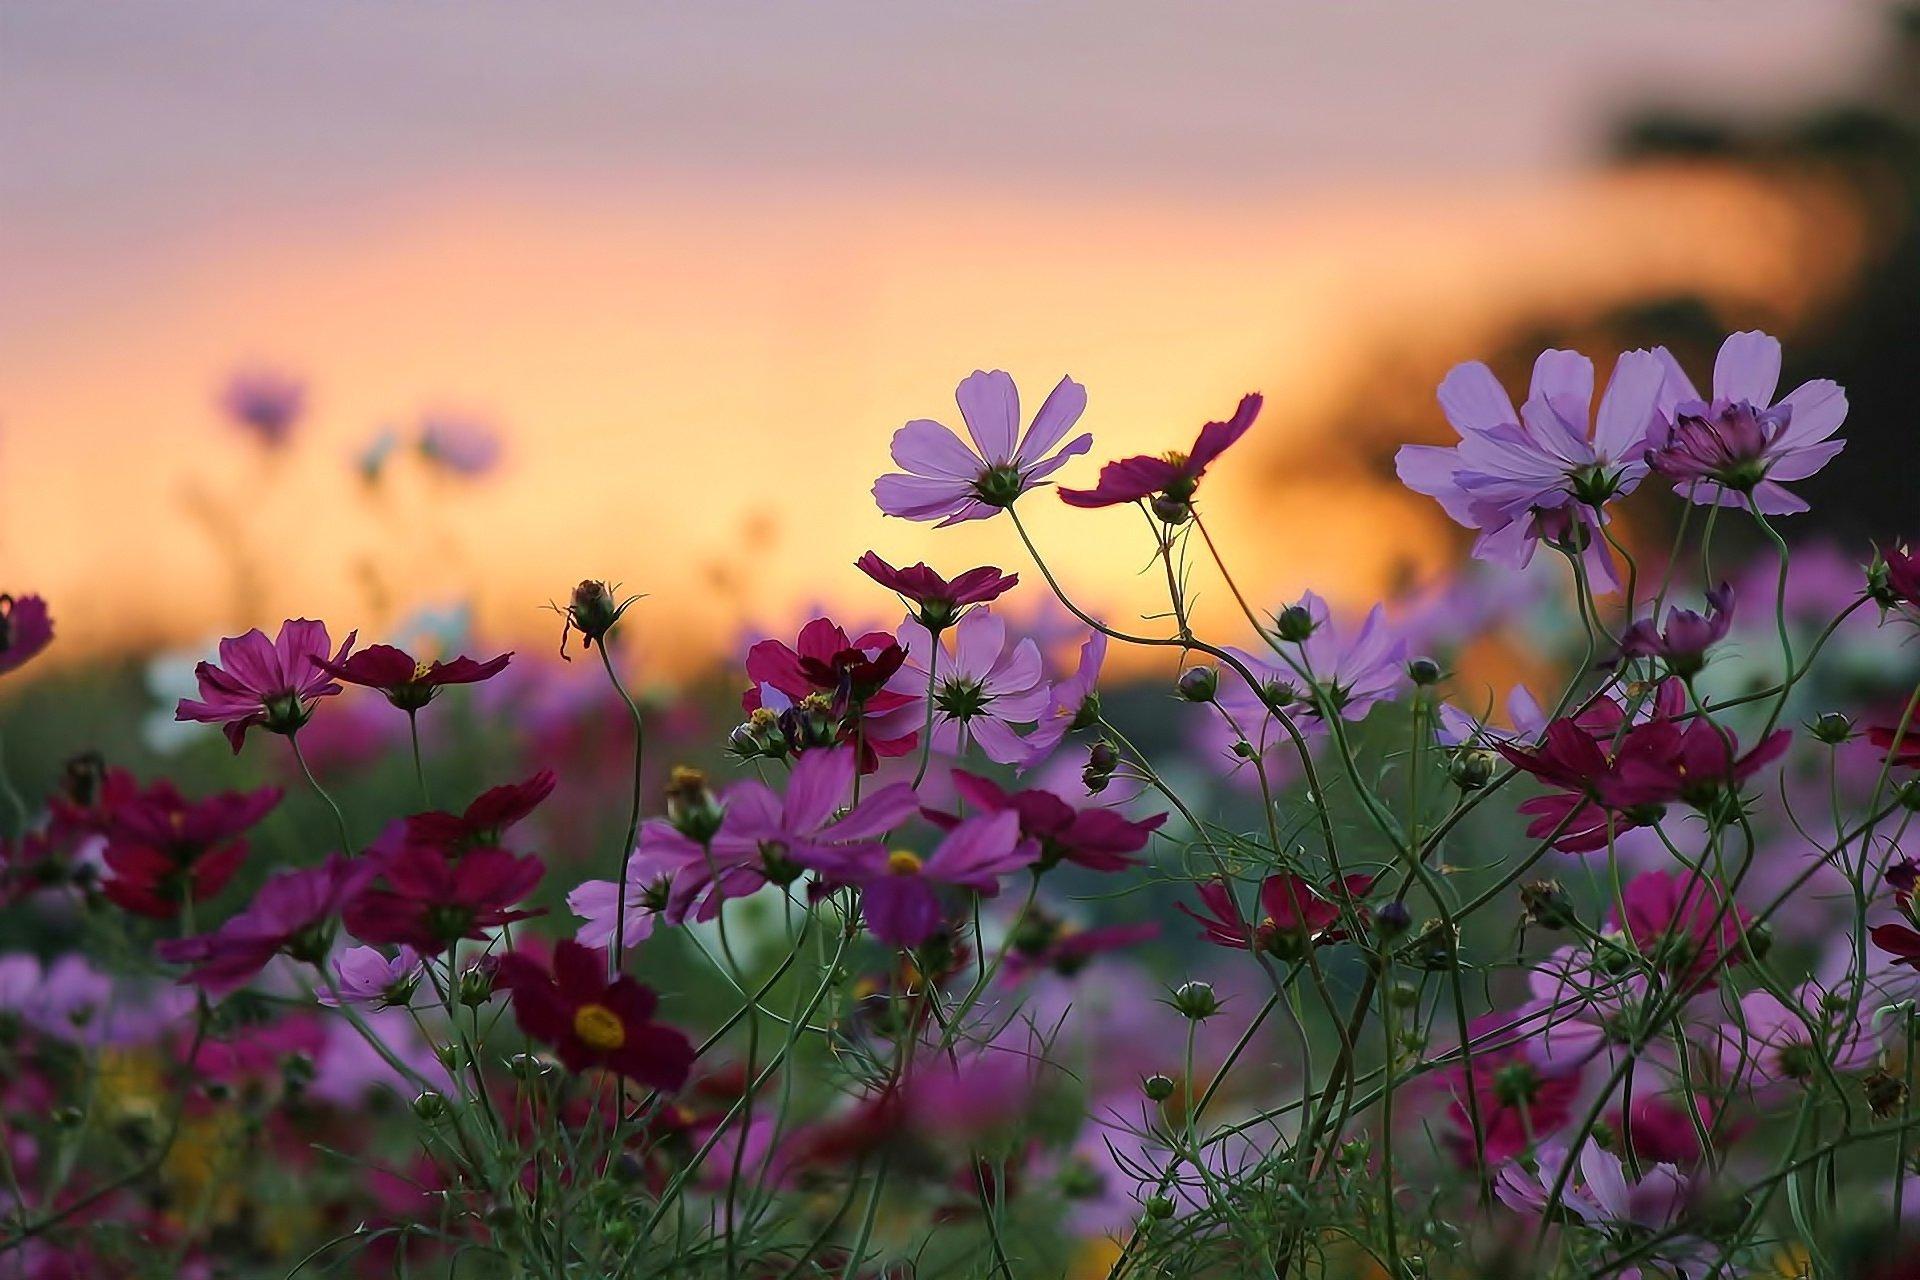 Обои цветок. Природа foto 8